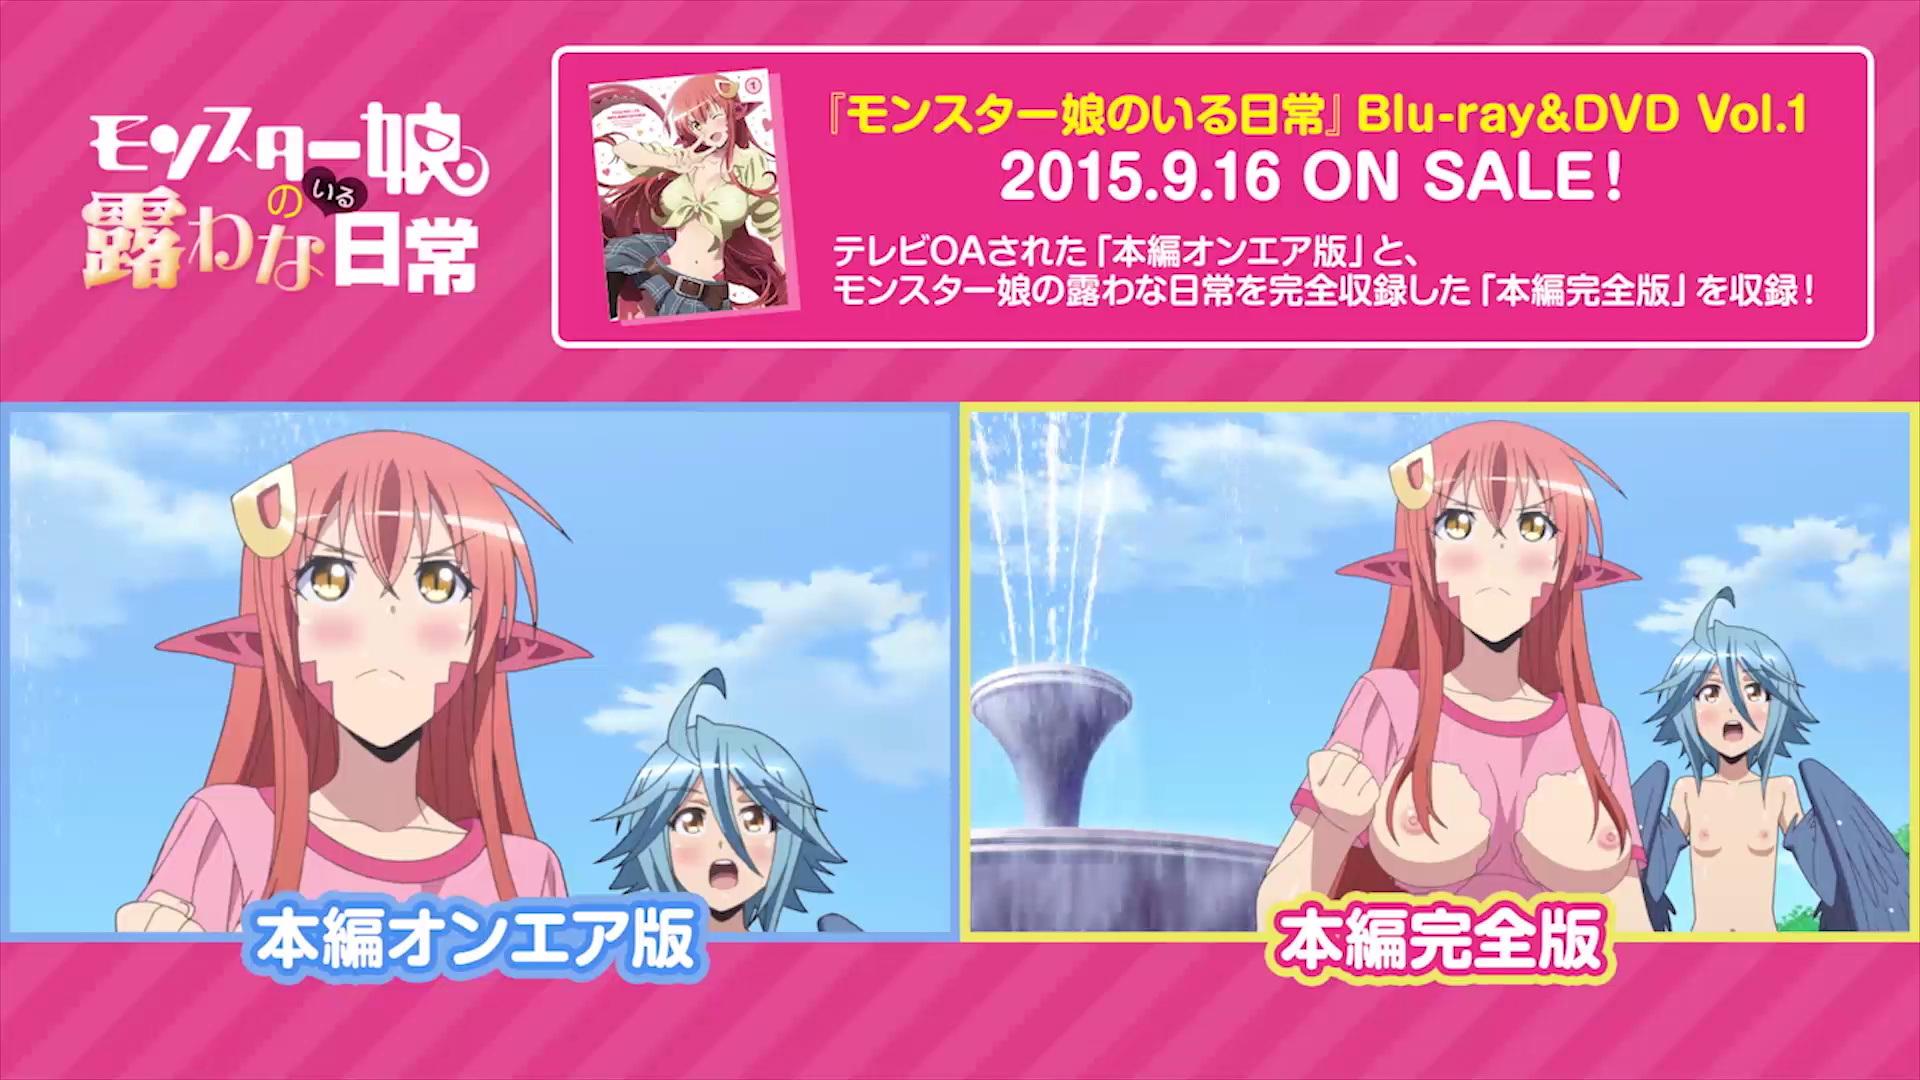 TV vs Blu-Ray Monster Musume anime blu-ray volume 1 uncensored 3